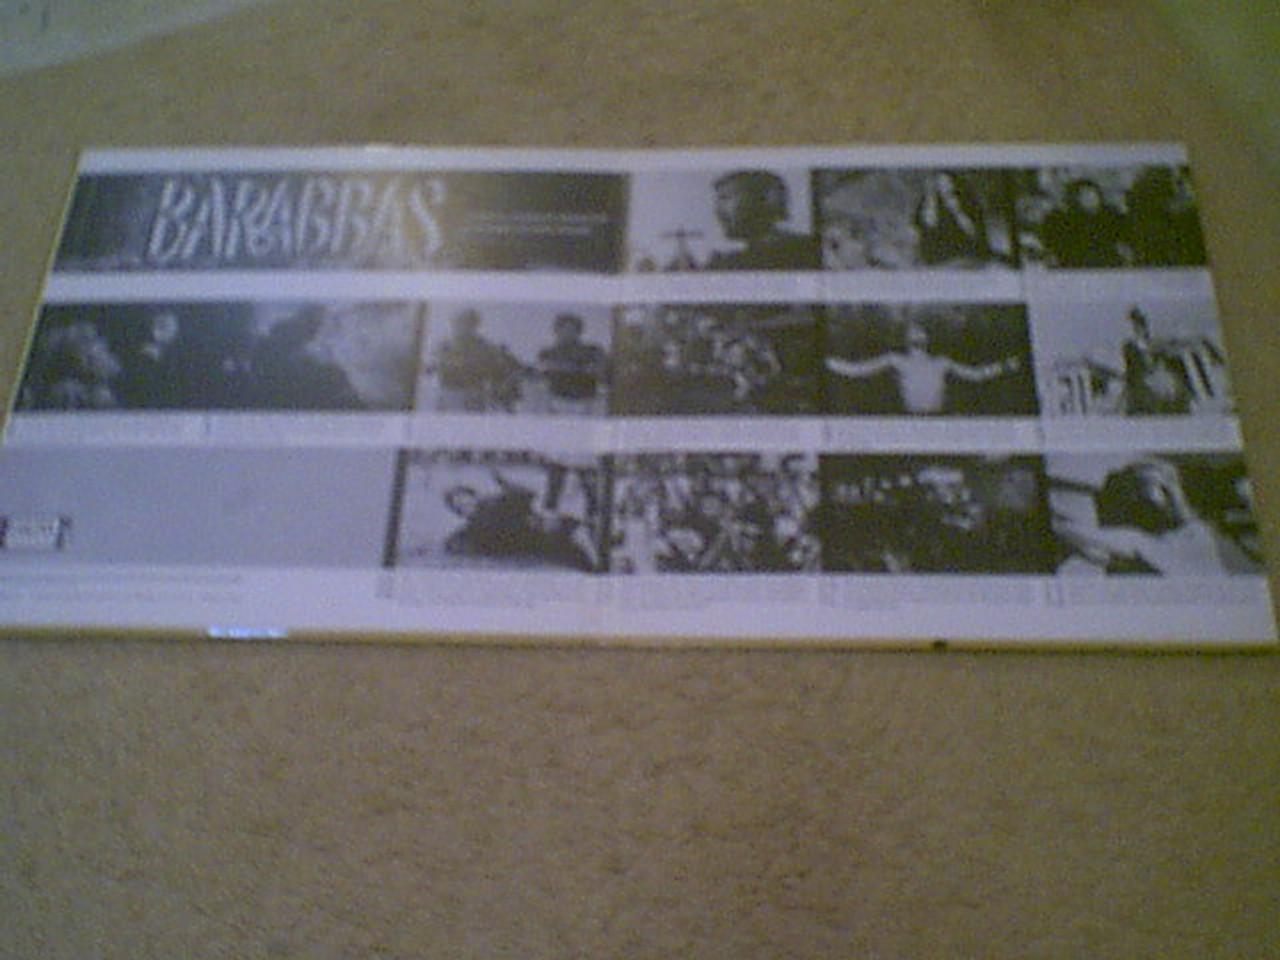 "Palance, Jack Anthony Quinn Silvana Mangano ""Barabbas"" 1962 LP Signed Autograph Photos"